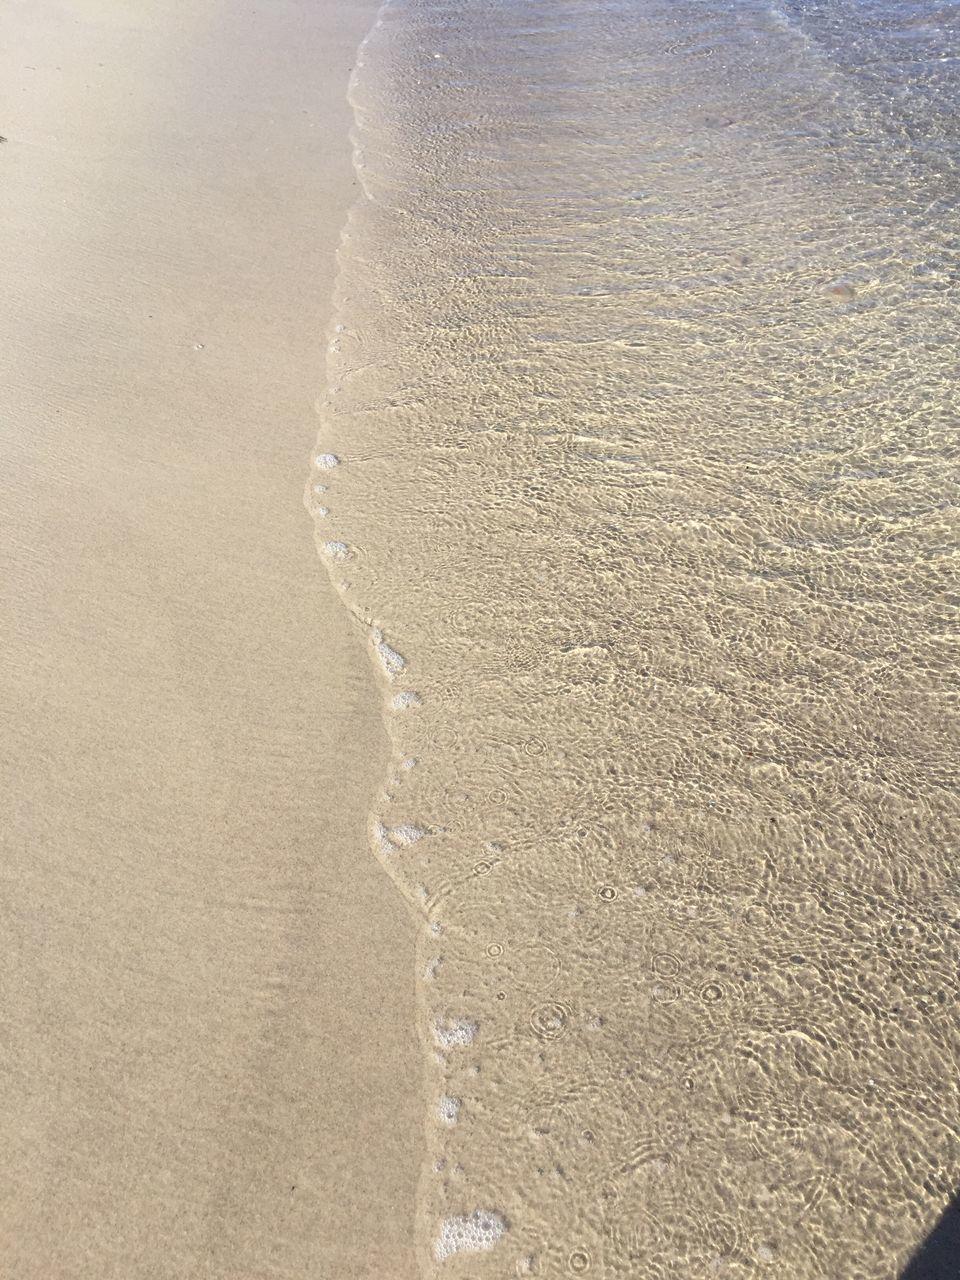 Close-Up Of Sand On Beach